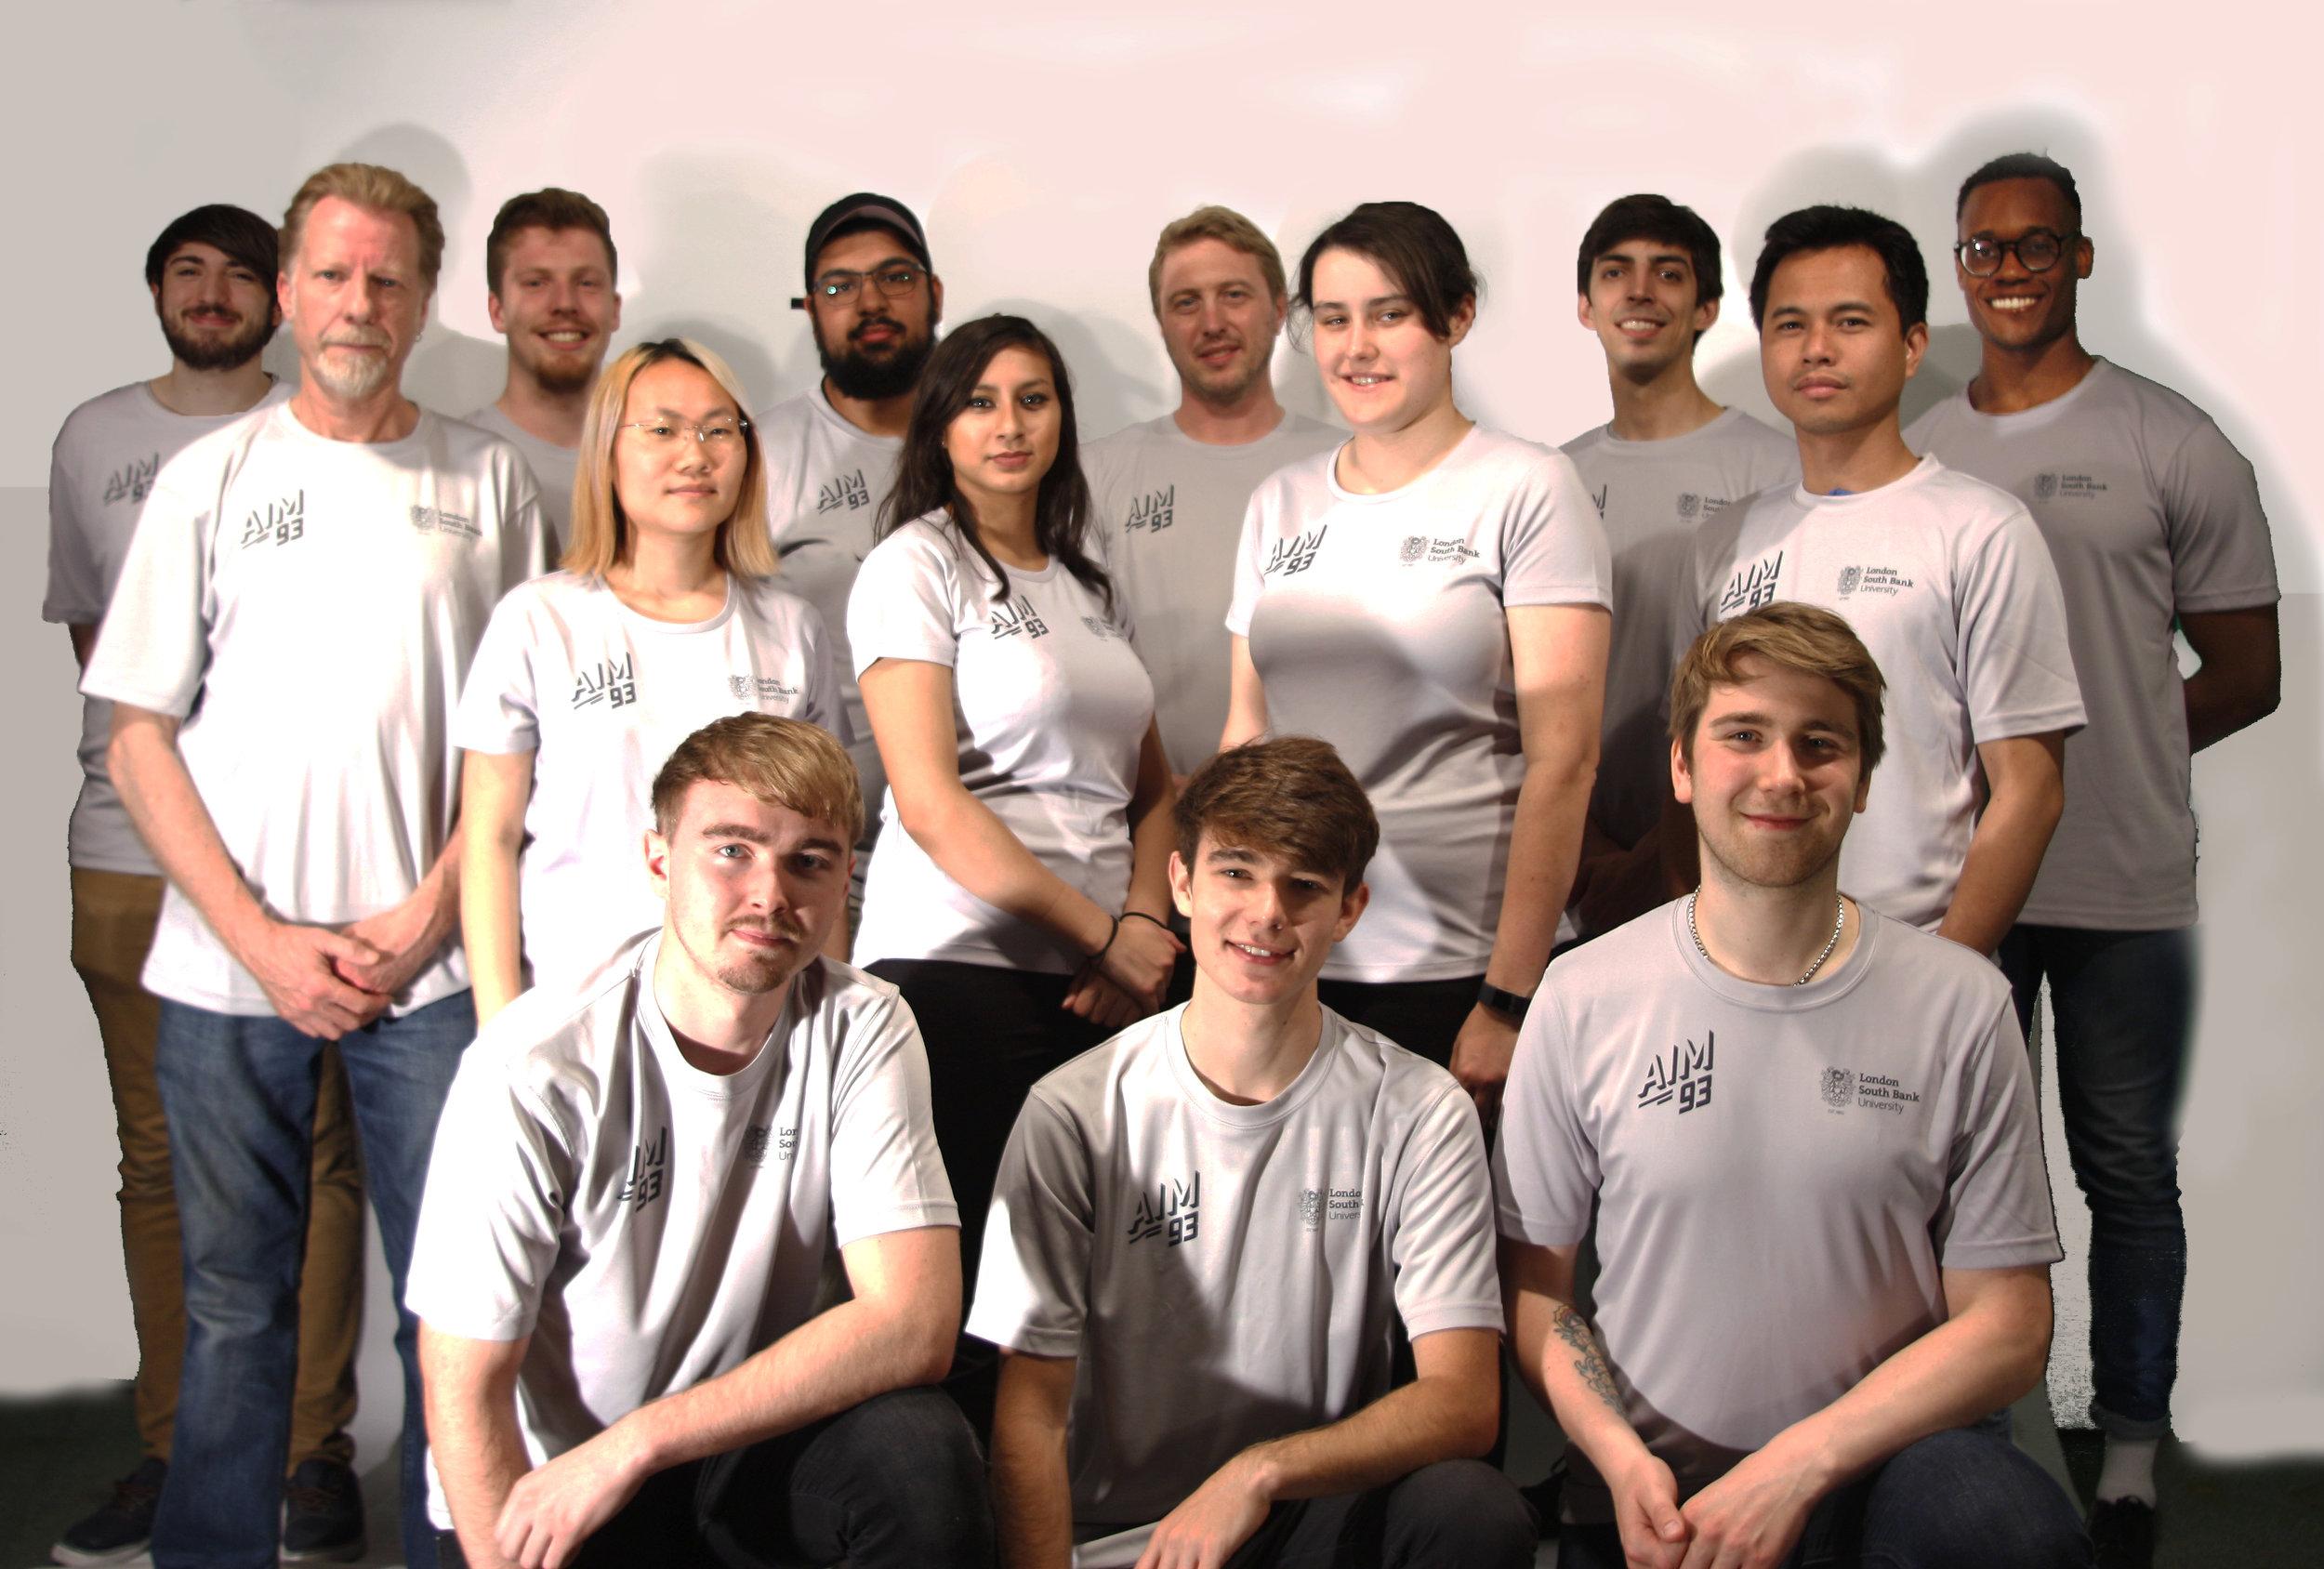 Aim93 Team 2019